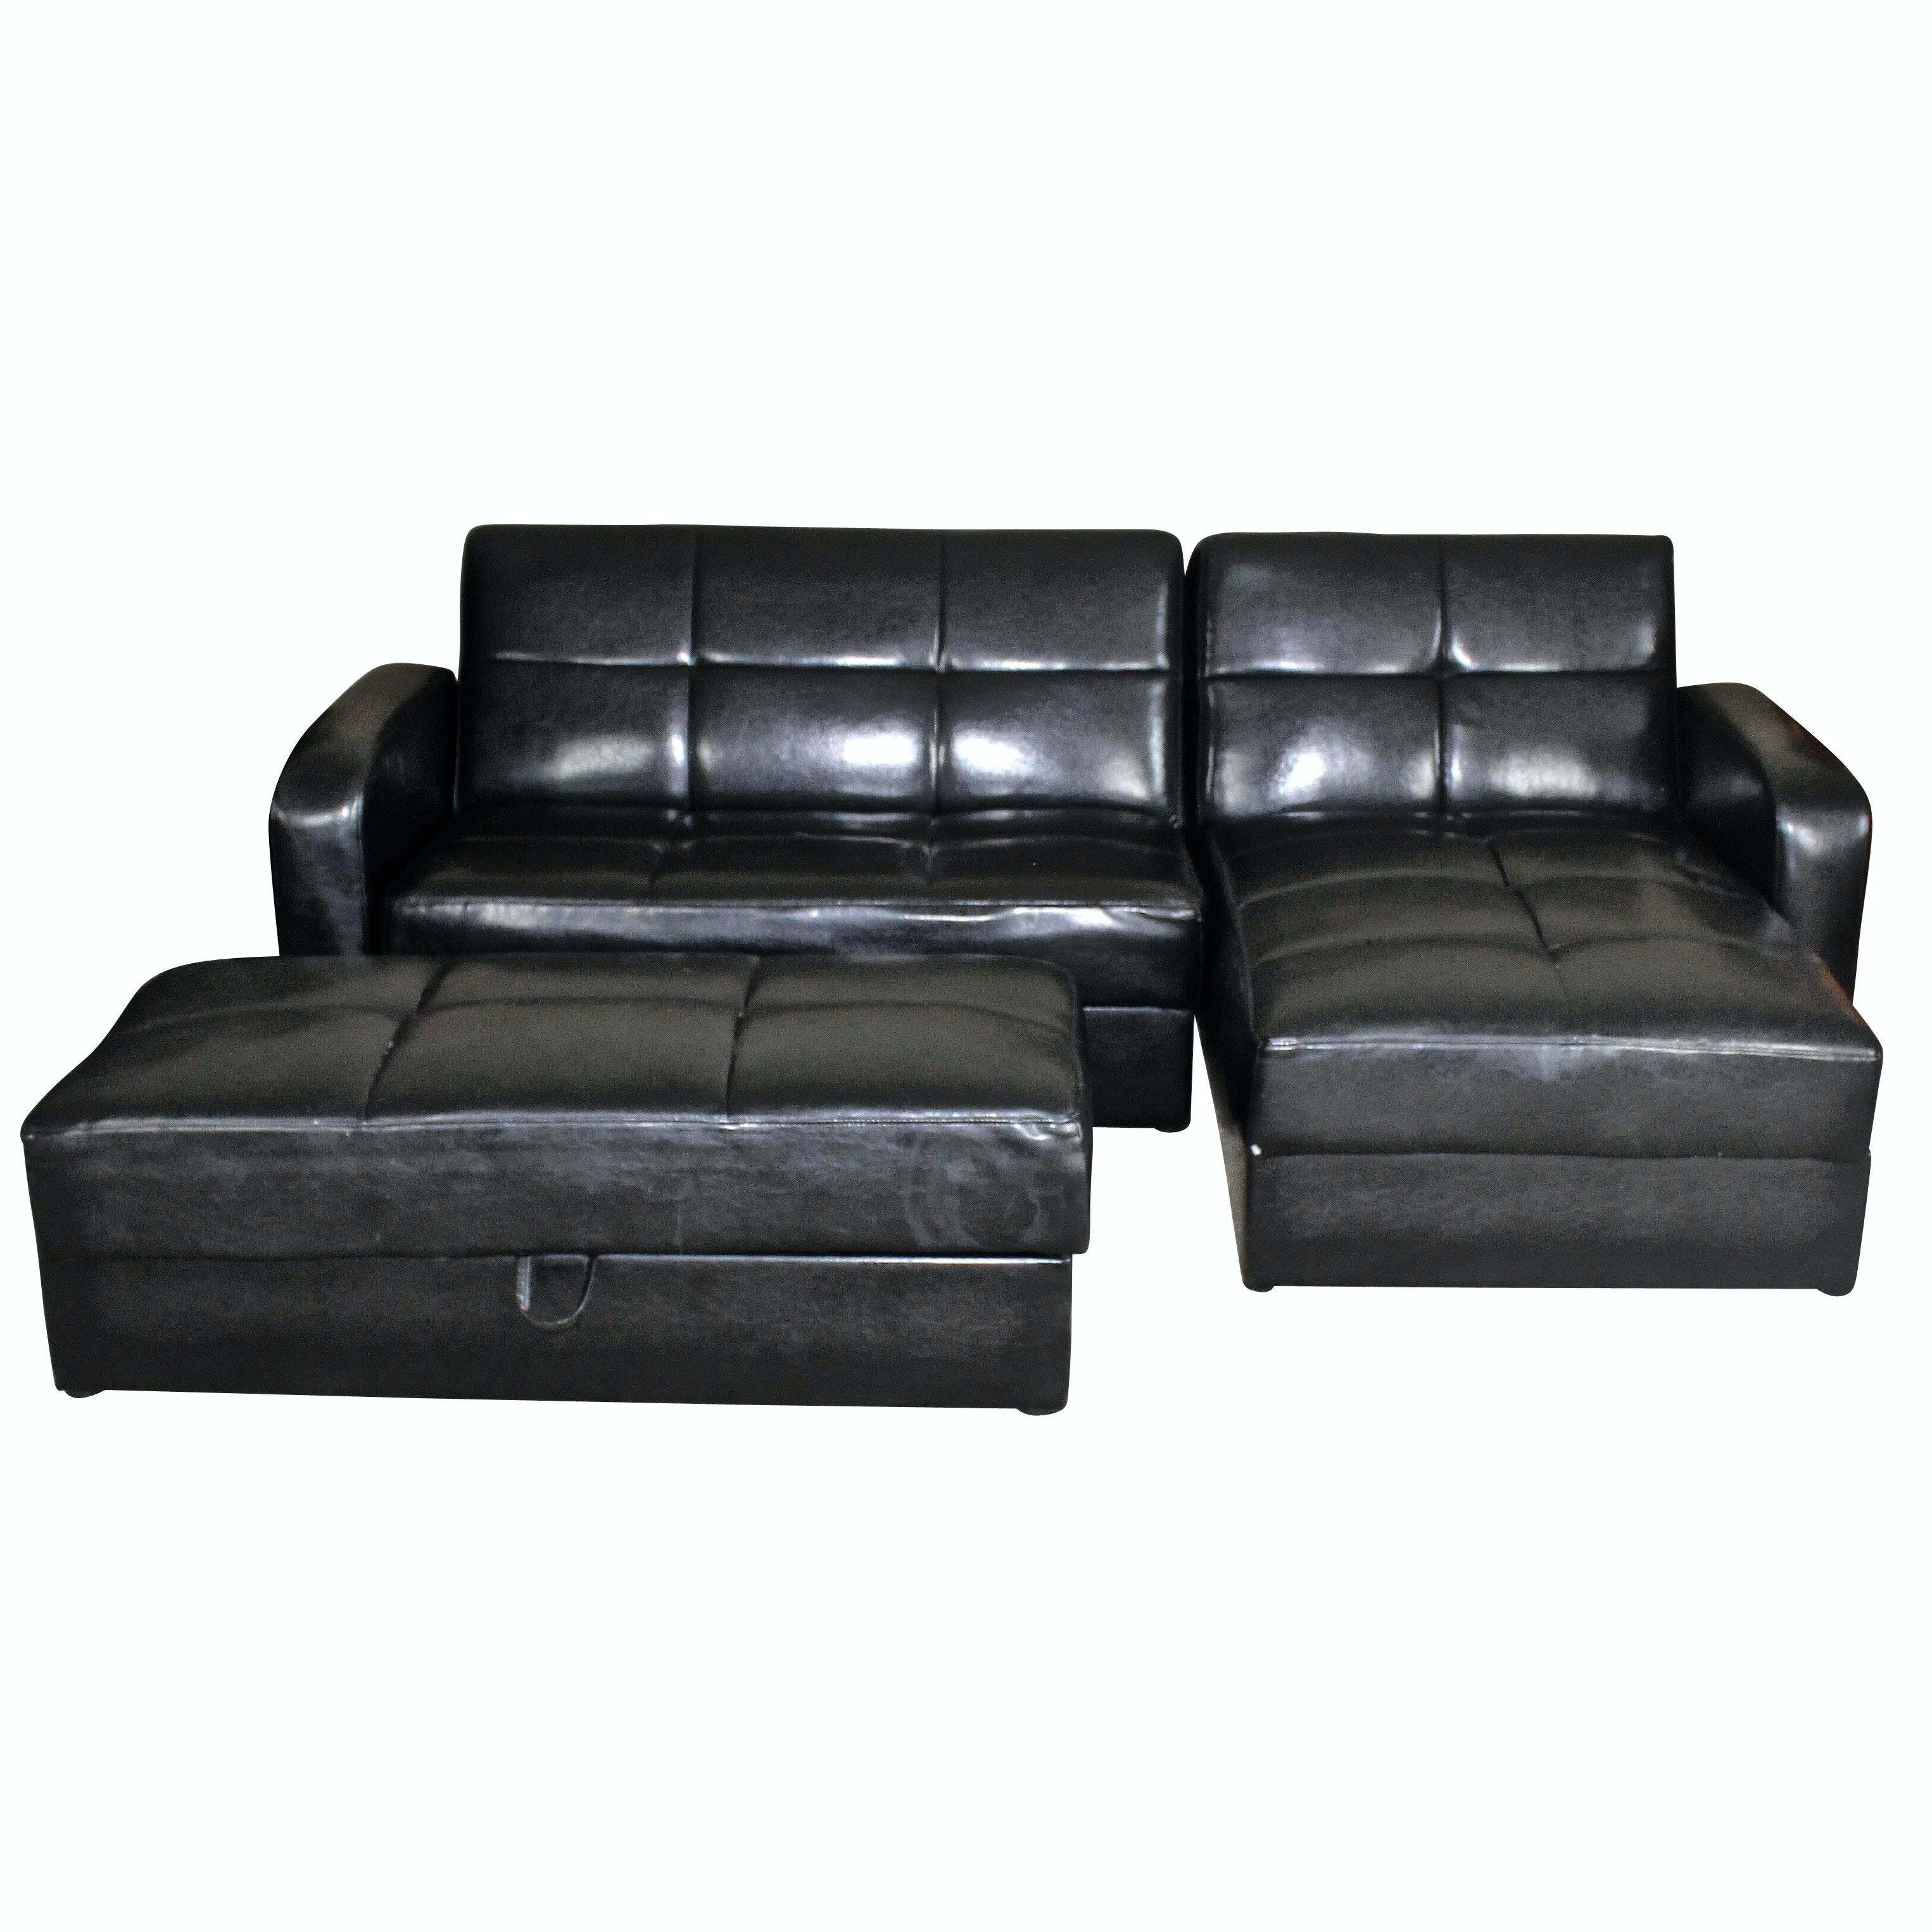 IKEA Storage Sectional Sofa In Black Vinyl ...